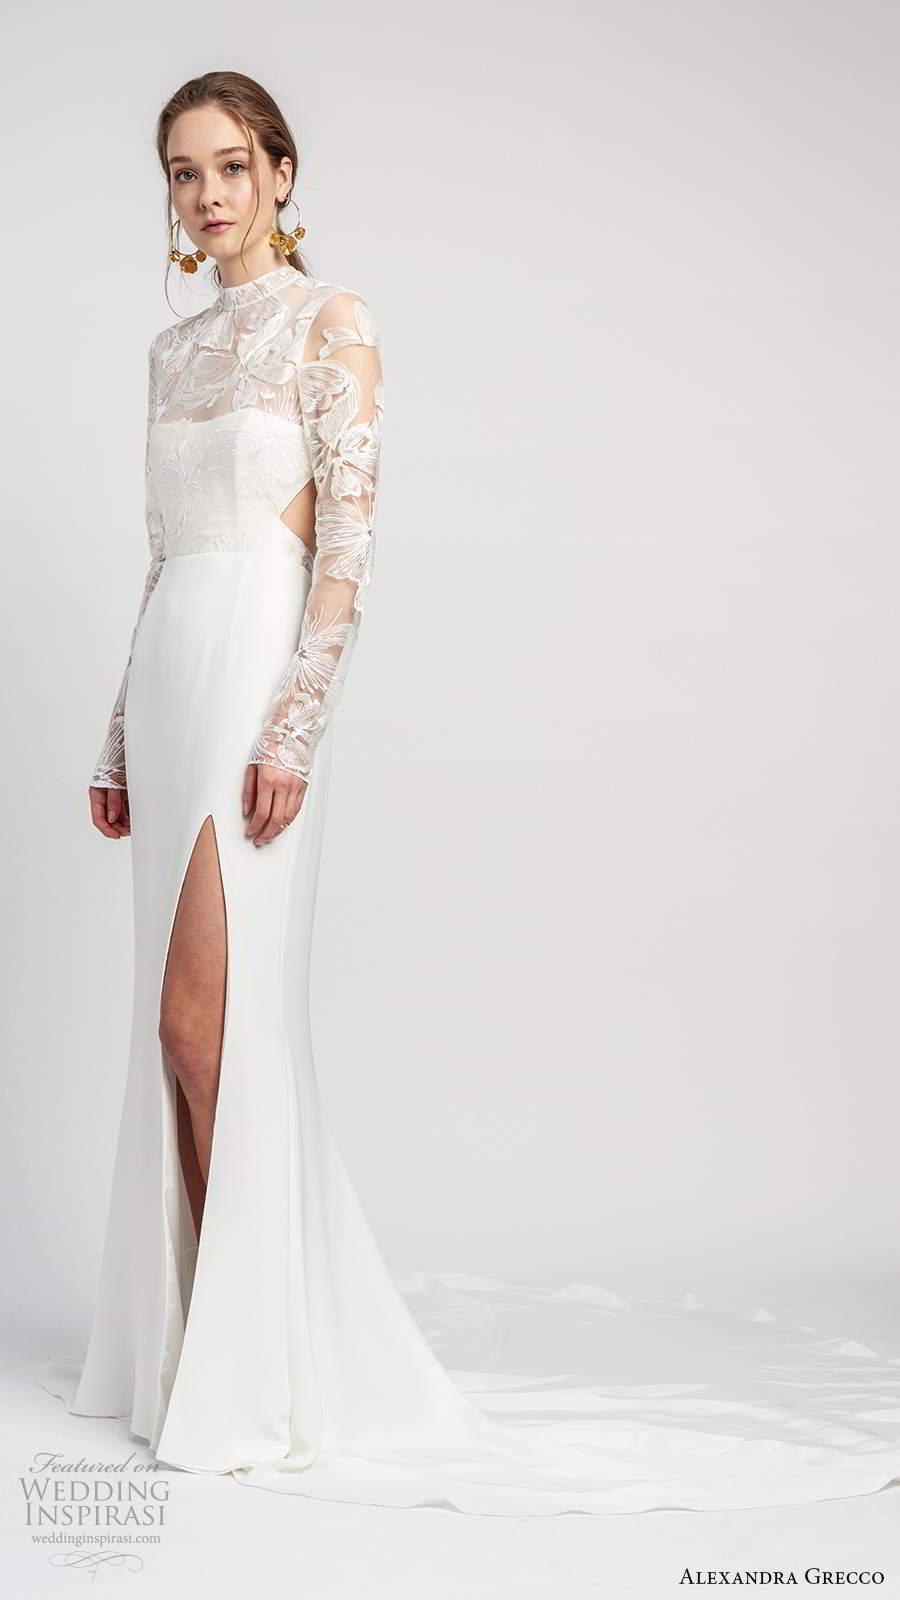 alexandra grecco 2020 bridal illusion long sleeves sheer high necklinge embellished lace bodice sheath wedding dress slit skirt cutout back cathedral train (4) mv